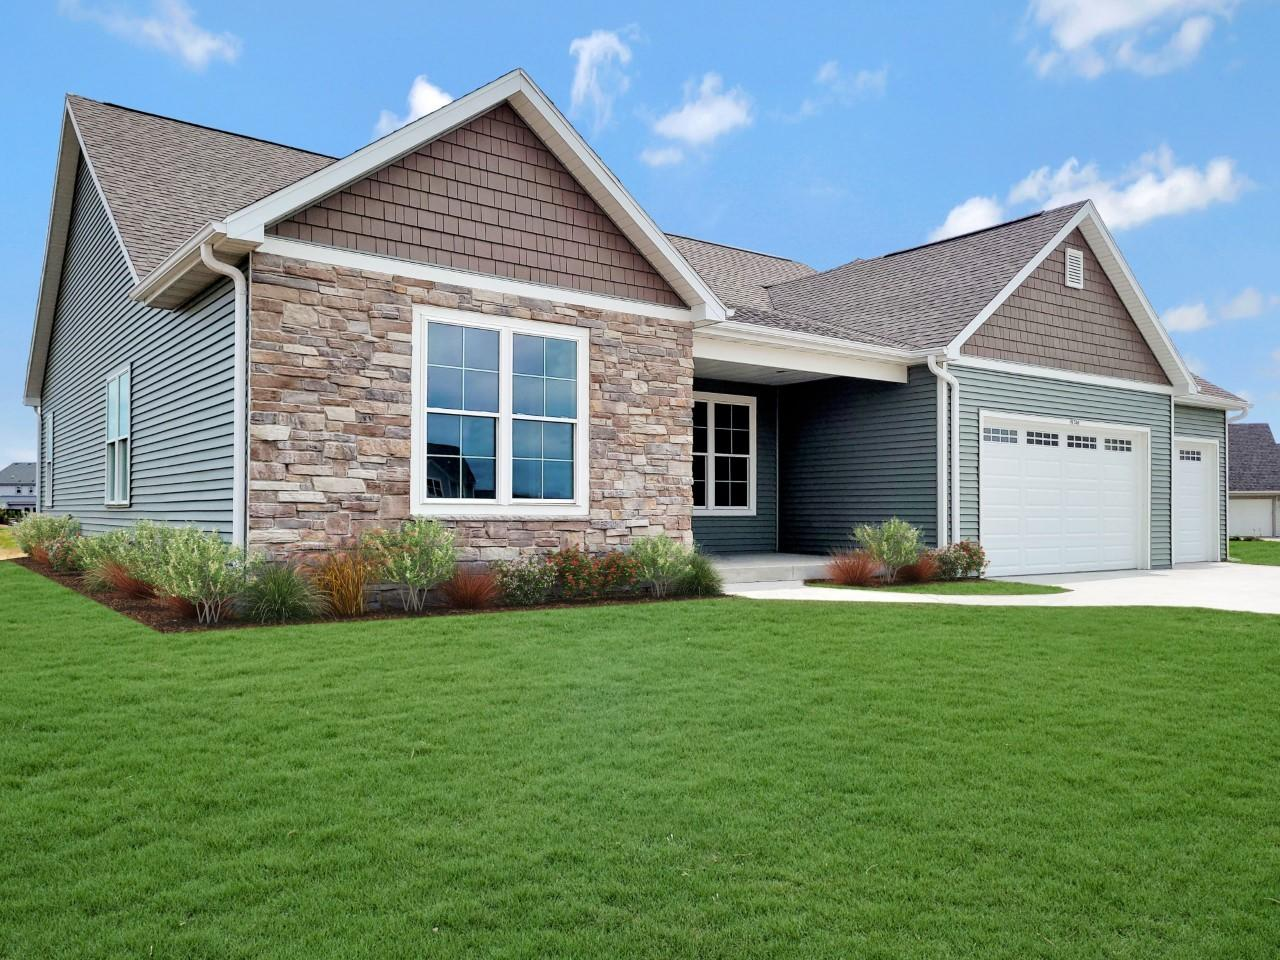 1346 Goldenrod Way, Oconomowoc, Wisconsin 53066, 3 Bedrooms Bedrooms, ,2 BathroomsBathrooms,Single-Family,For Sale,Goldenrod Way,1753057